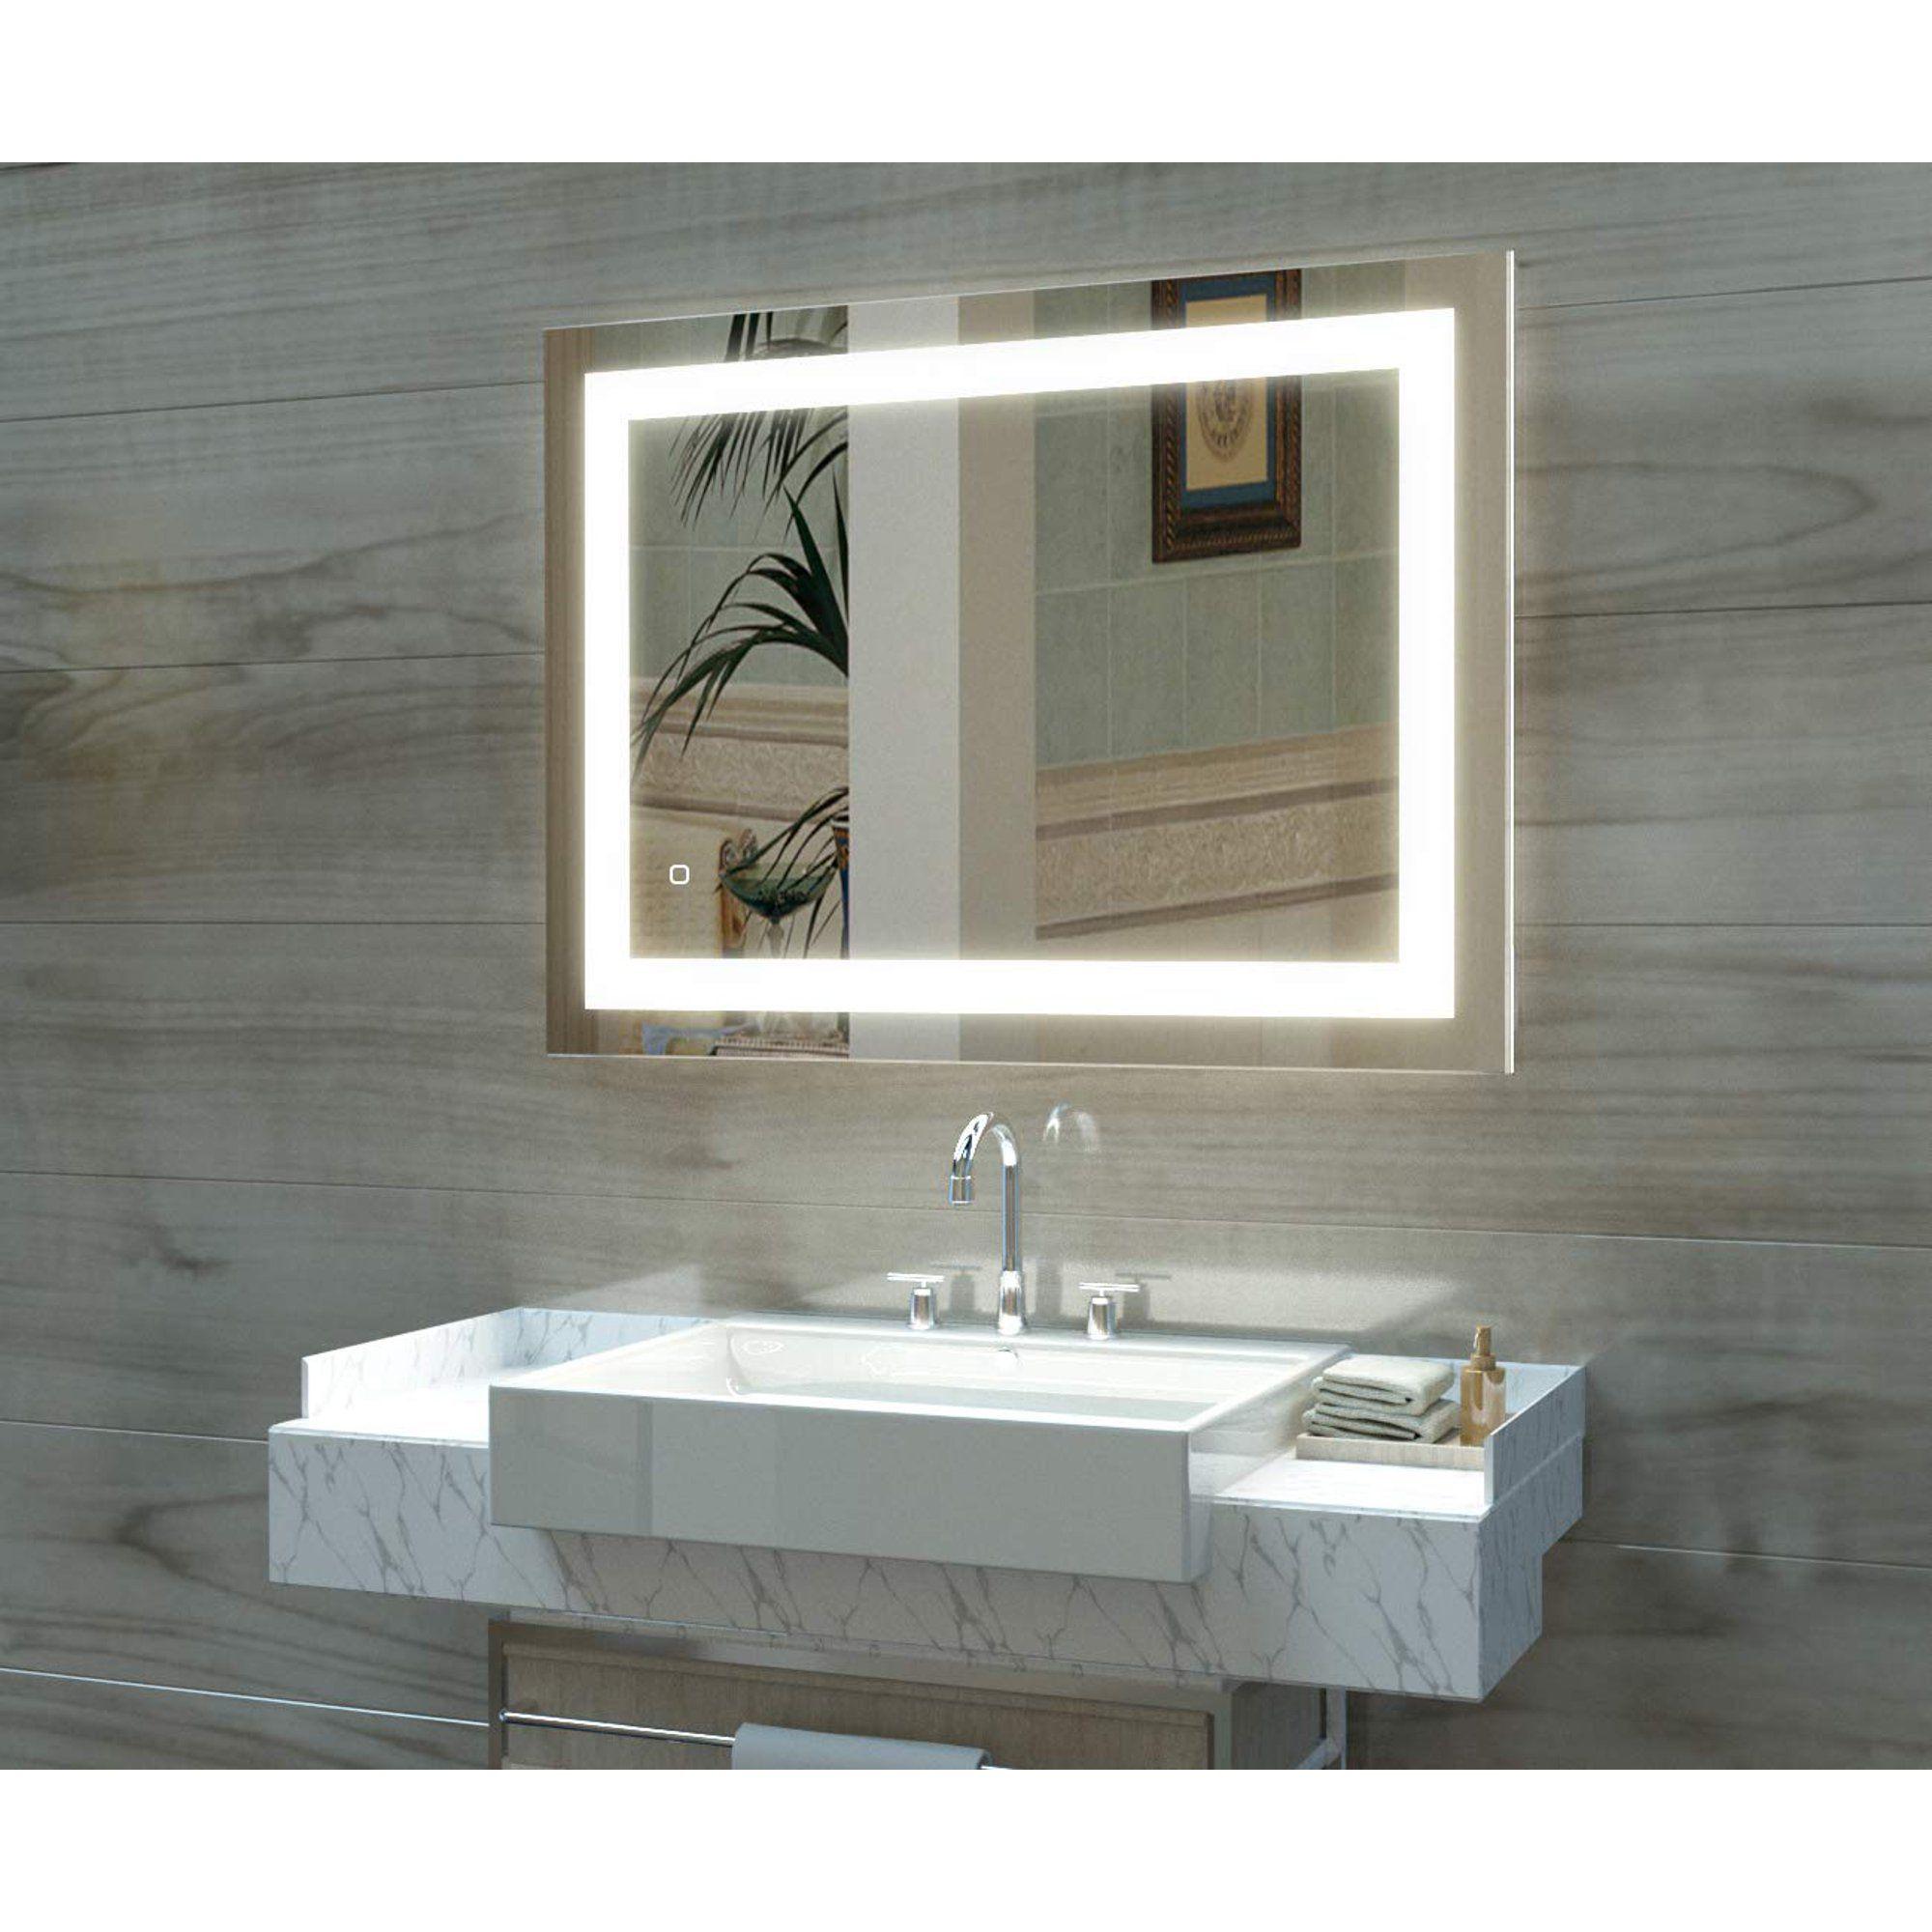 Ktaxon Anti Fog Led Backlit Mirror Illuminated Wall Mirror Bathroom Mirror With Touch Button Walmart Com Bathroom Wall Hanging Led Mirror Bathroom Wall Mounted Mirror [ 2000 x 2000 Pixel ]